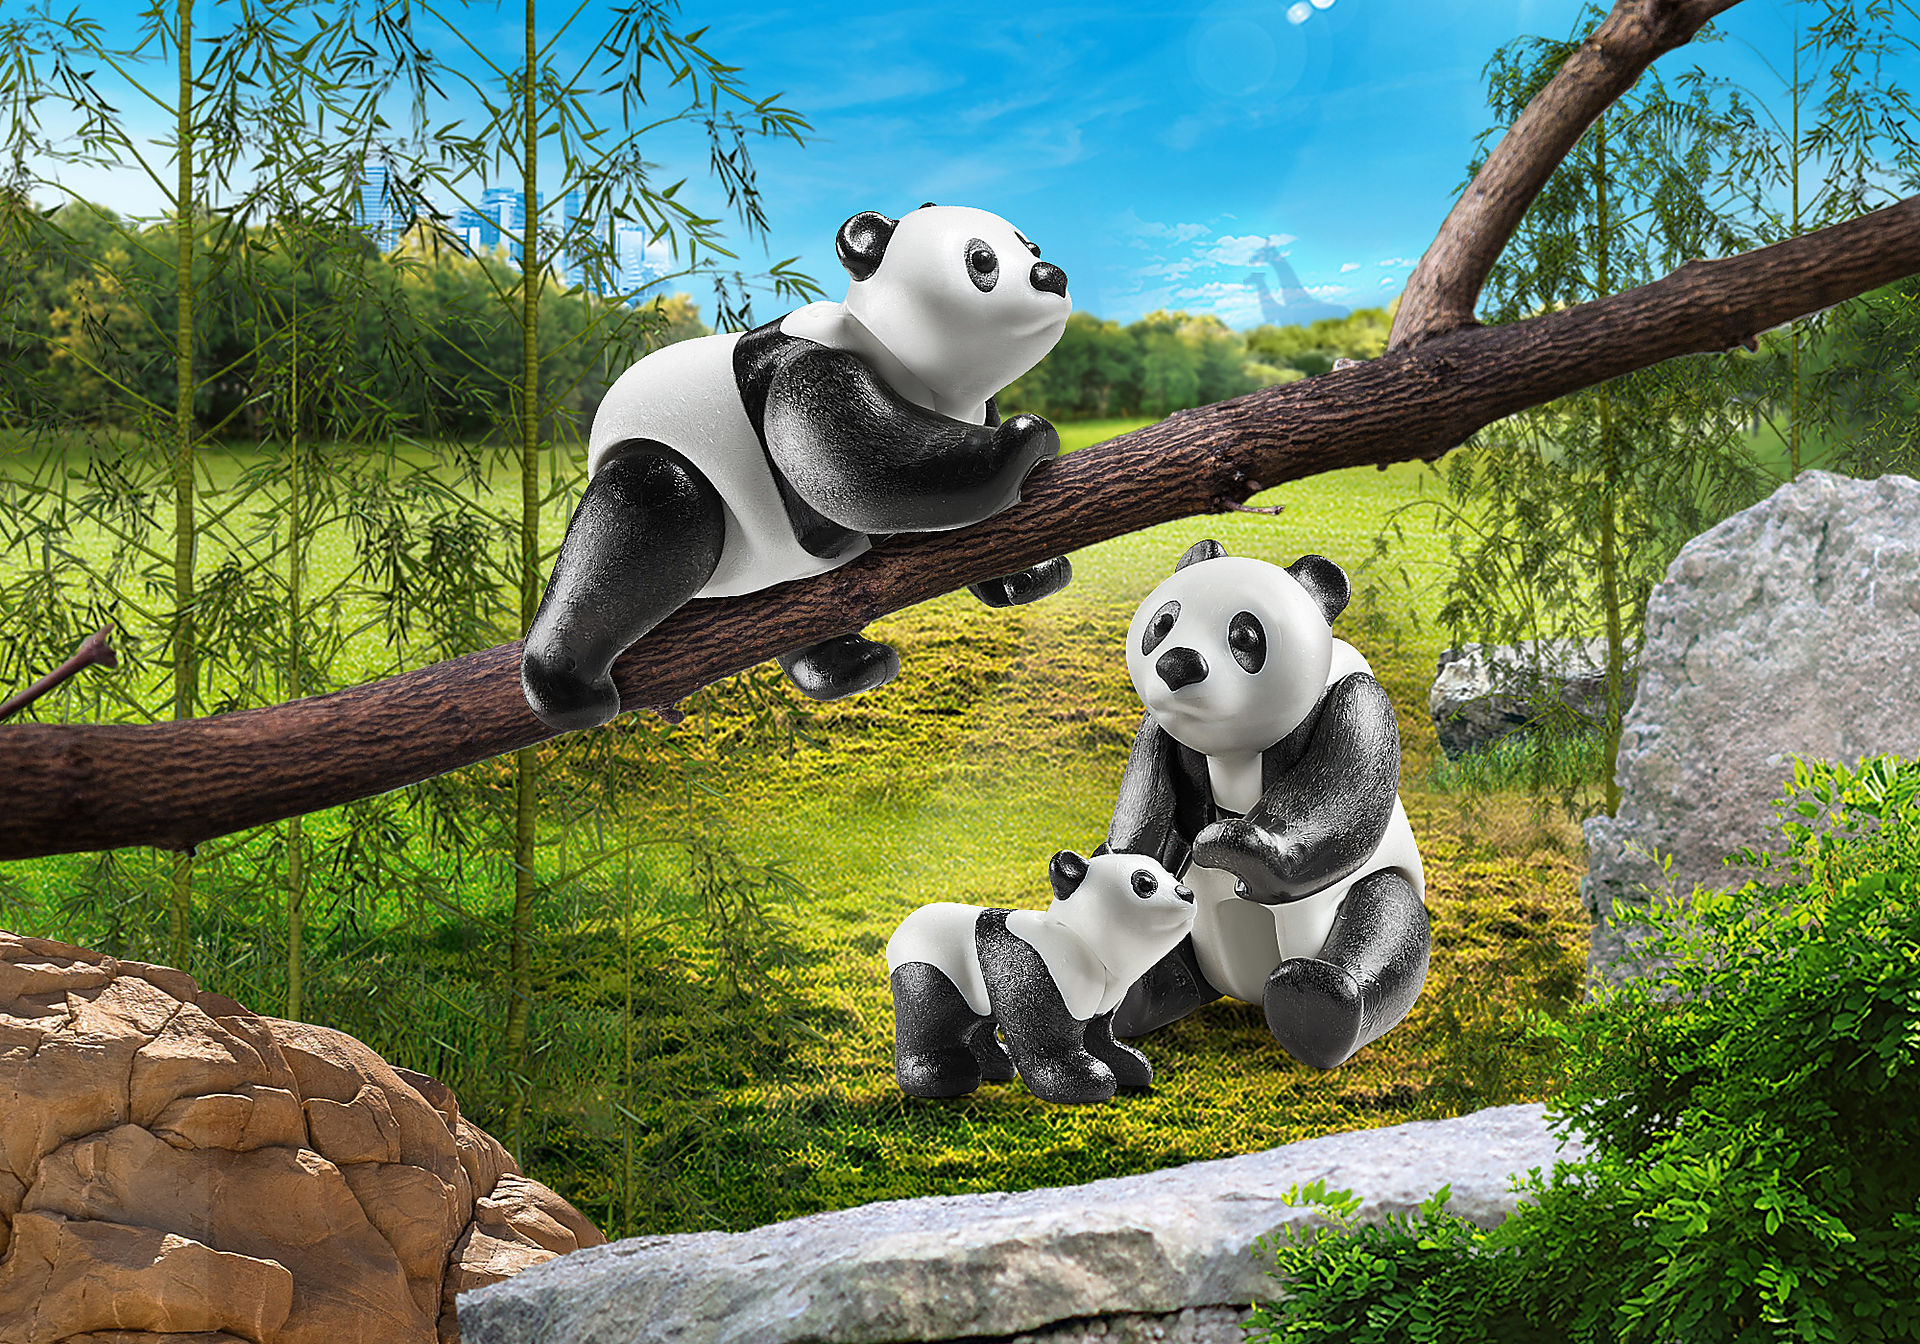 70353 2 panda bébivel zoom image1